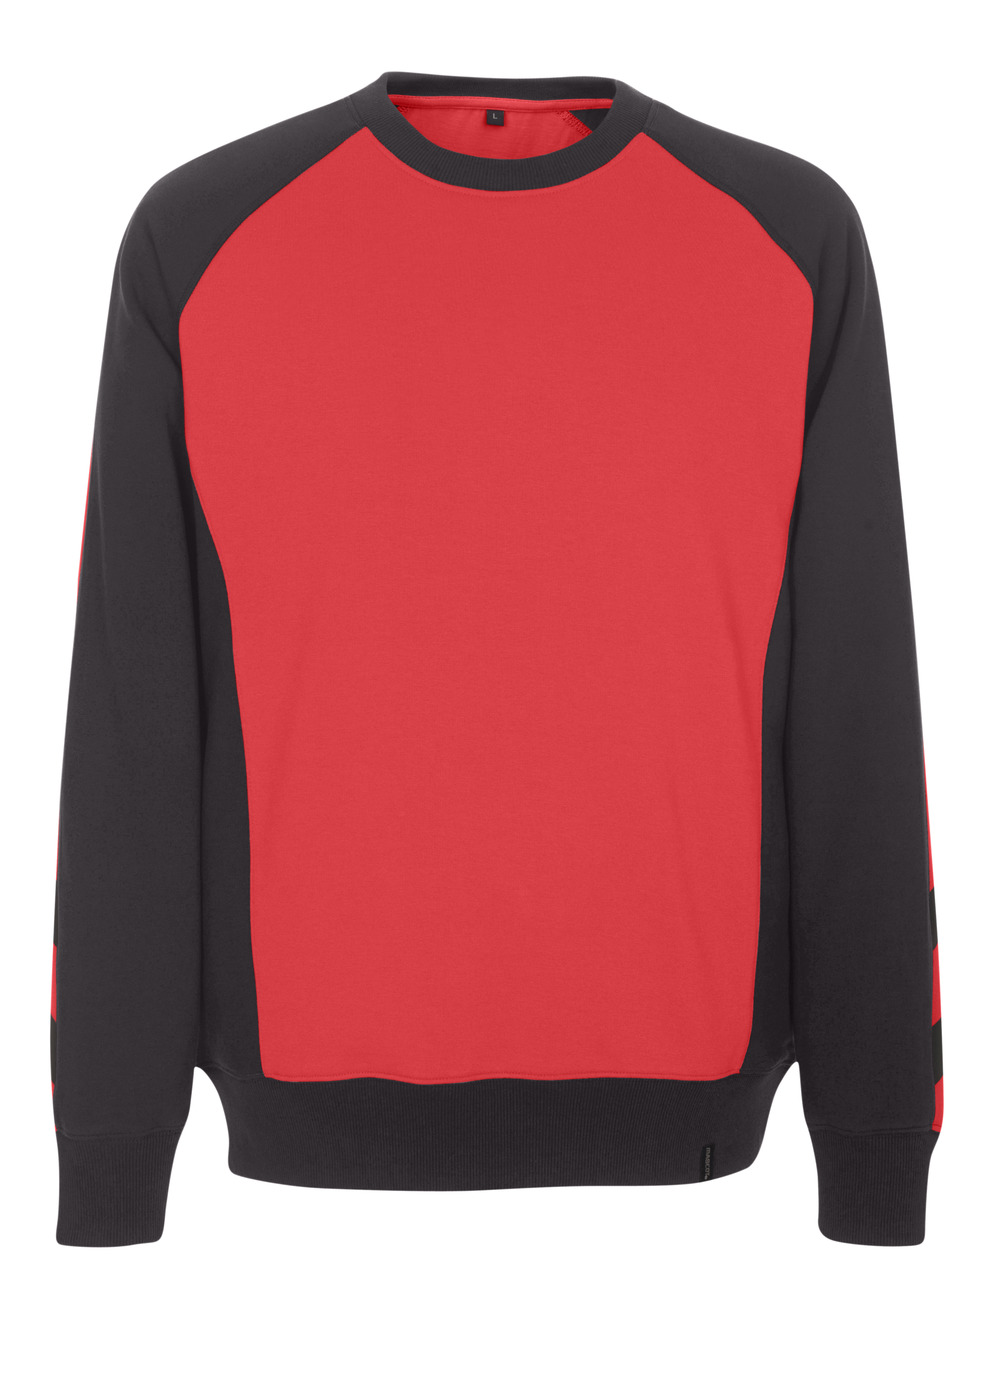 50570-962-0209 Sweatshirt - rød/sort